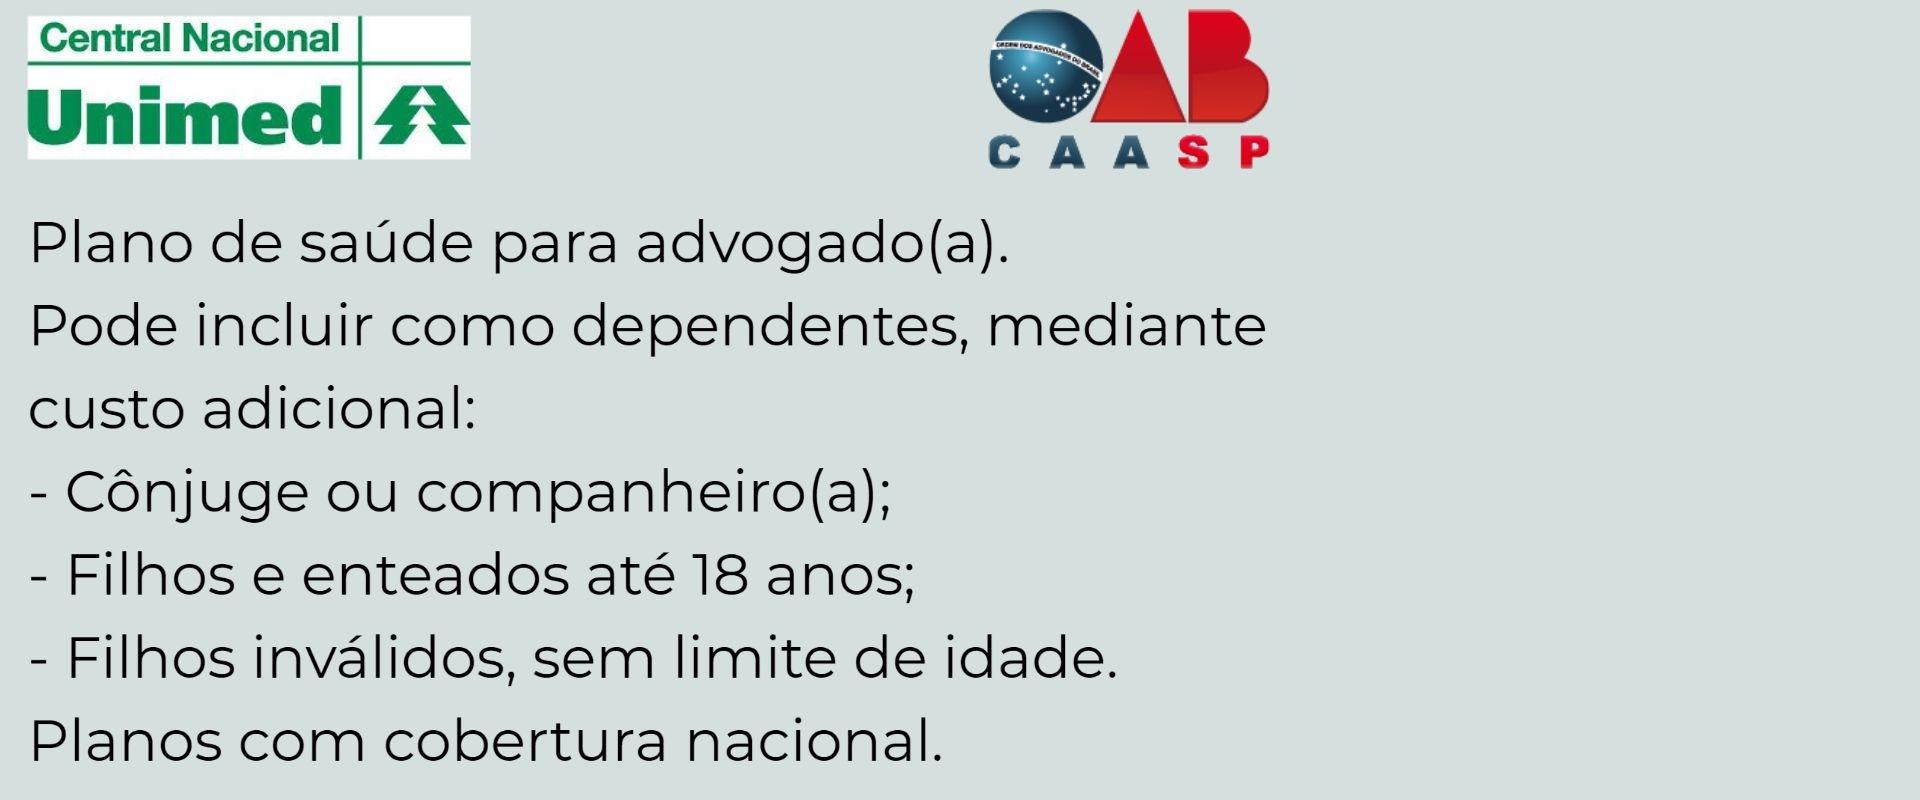 Unimed CAASP Americana